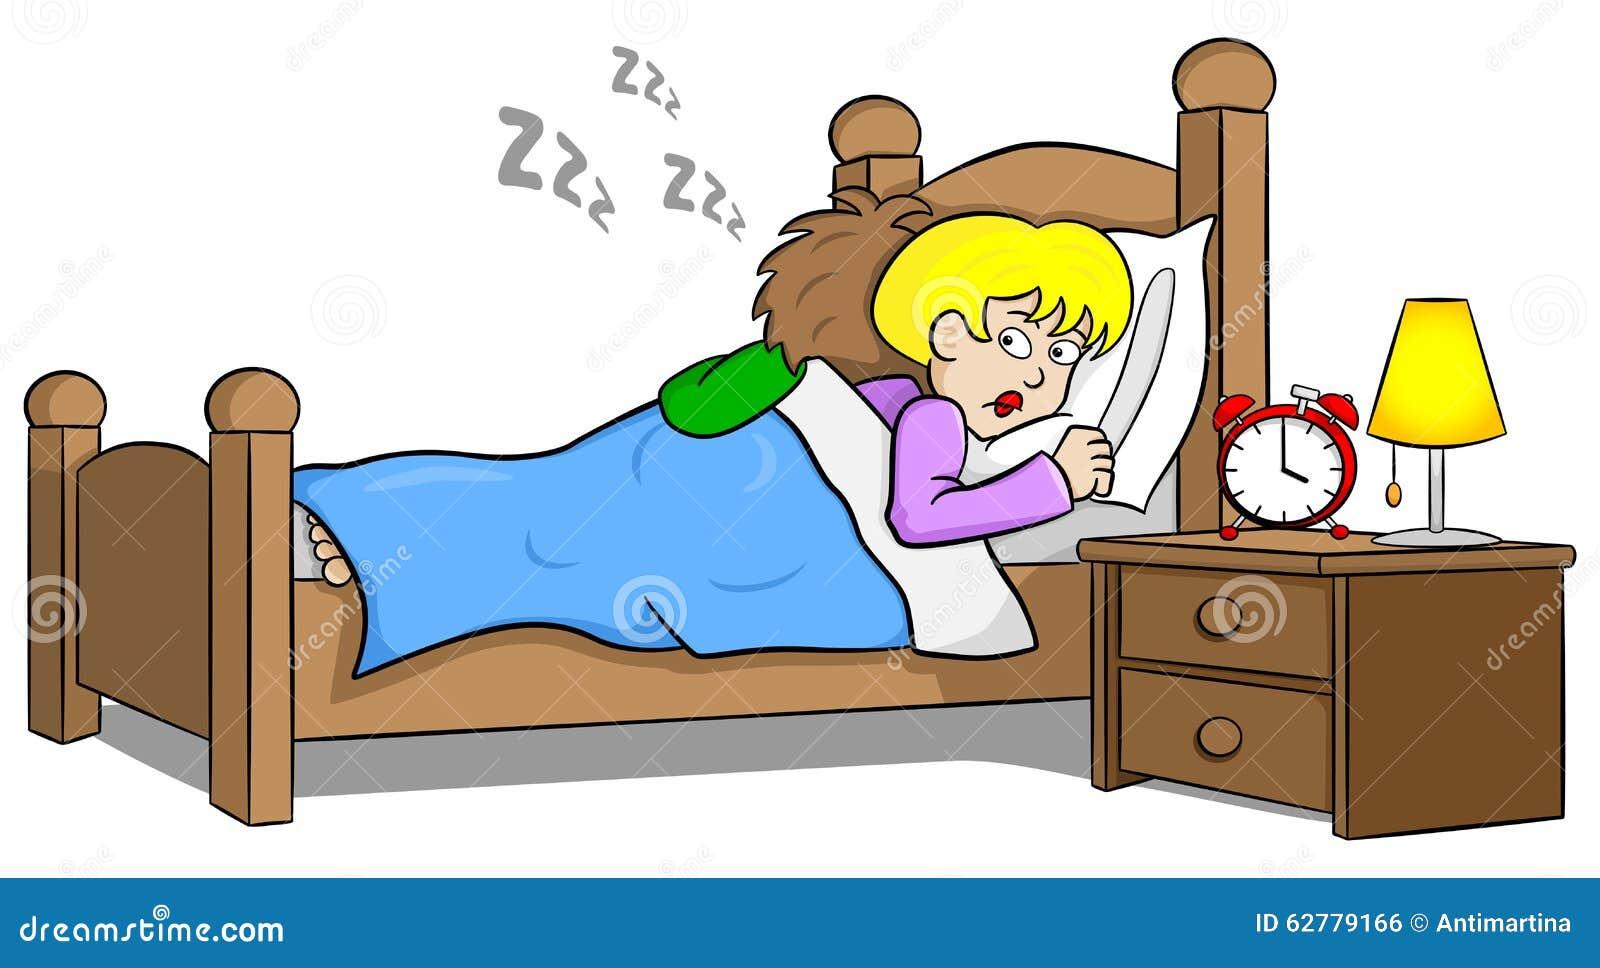 Snoring man and sleepless woman